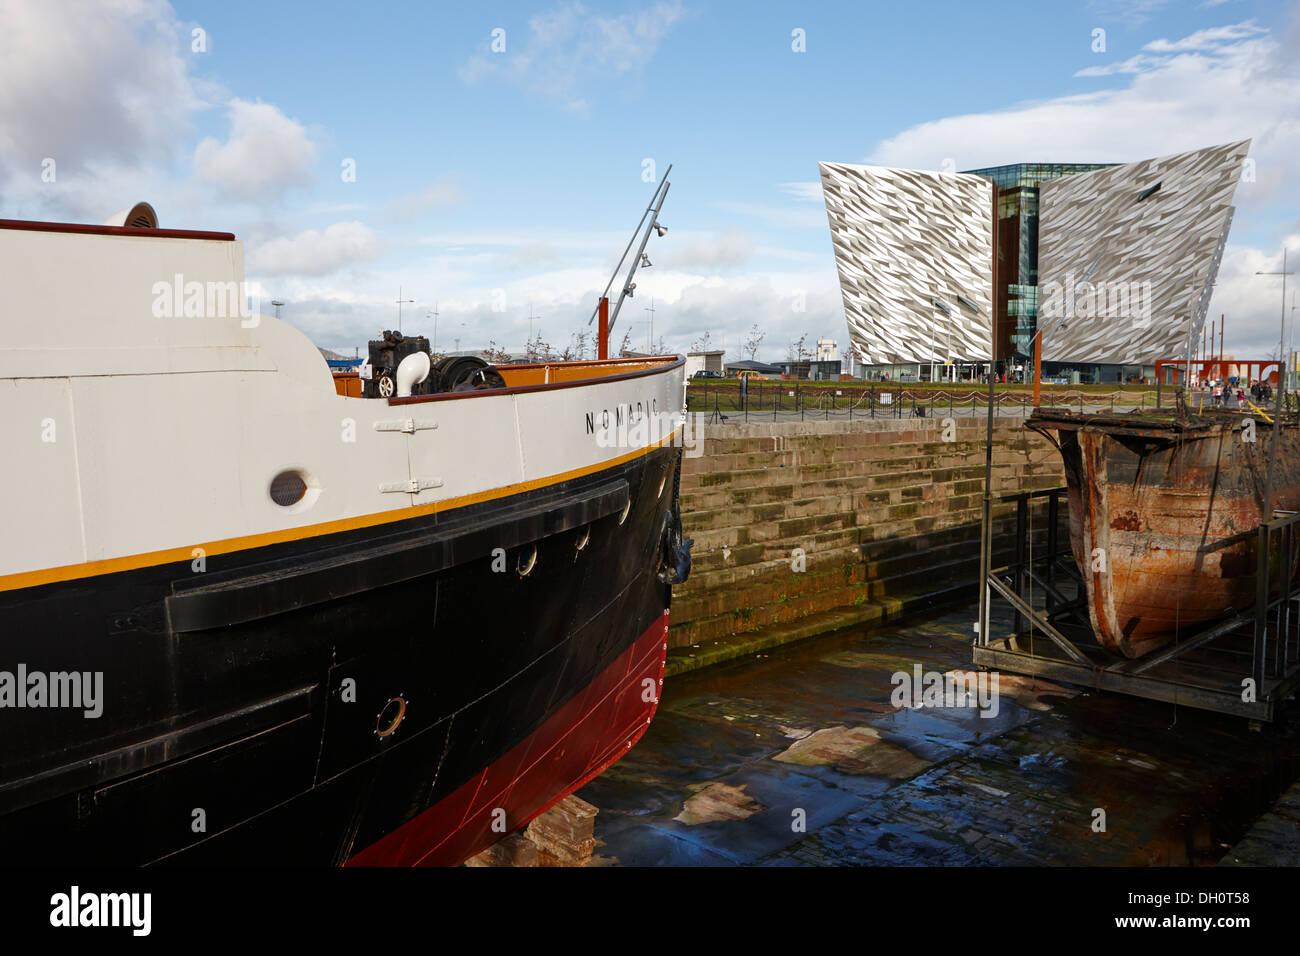 ss nomadic visitor attraction and titanic belfast centre titanic quarter Belfast Northern Ireland - Stock Image